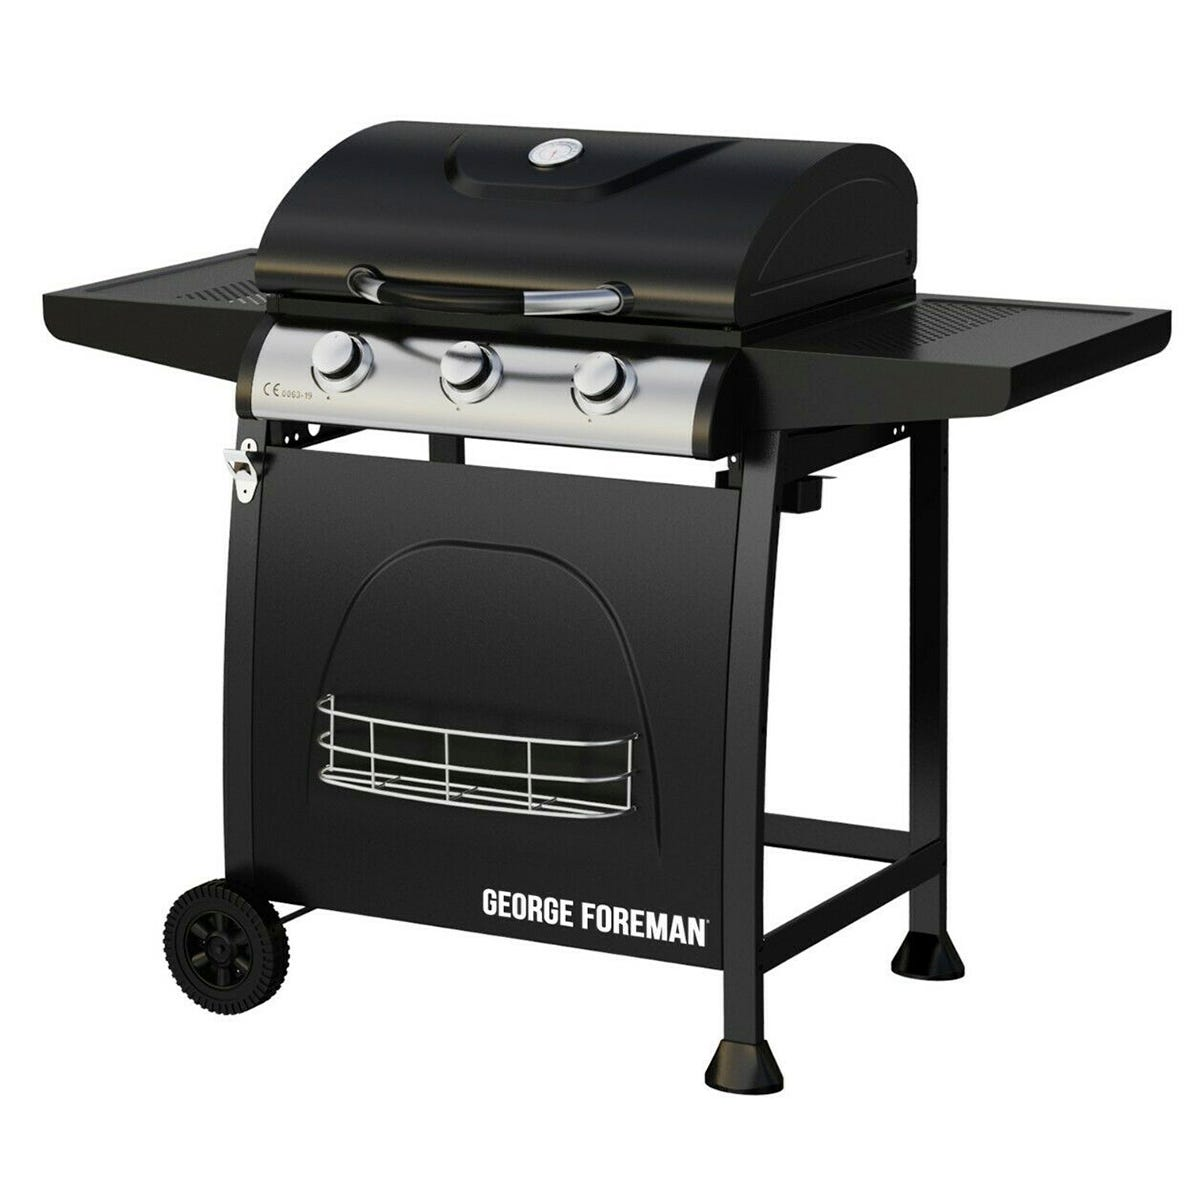 Image of George Foreman 3 Burner Gas BBQ